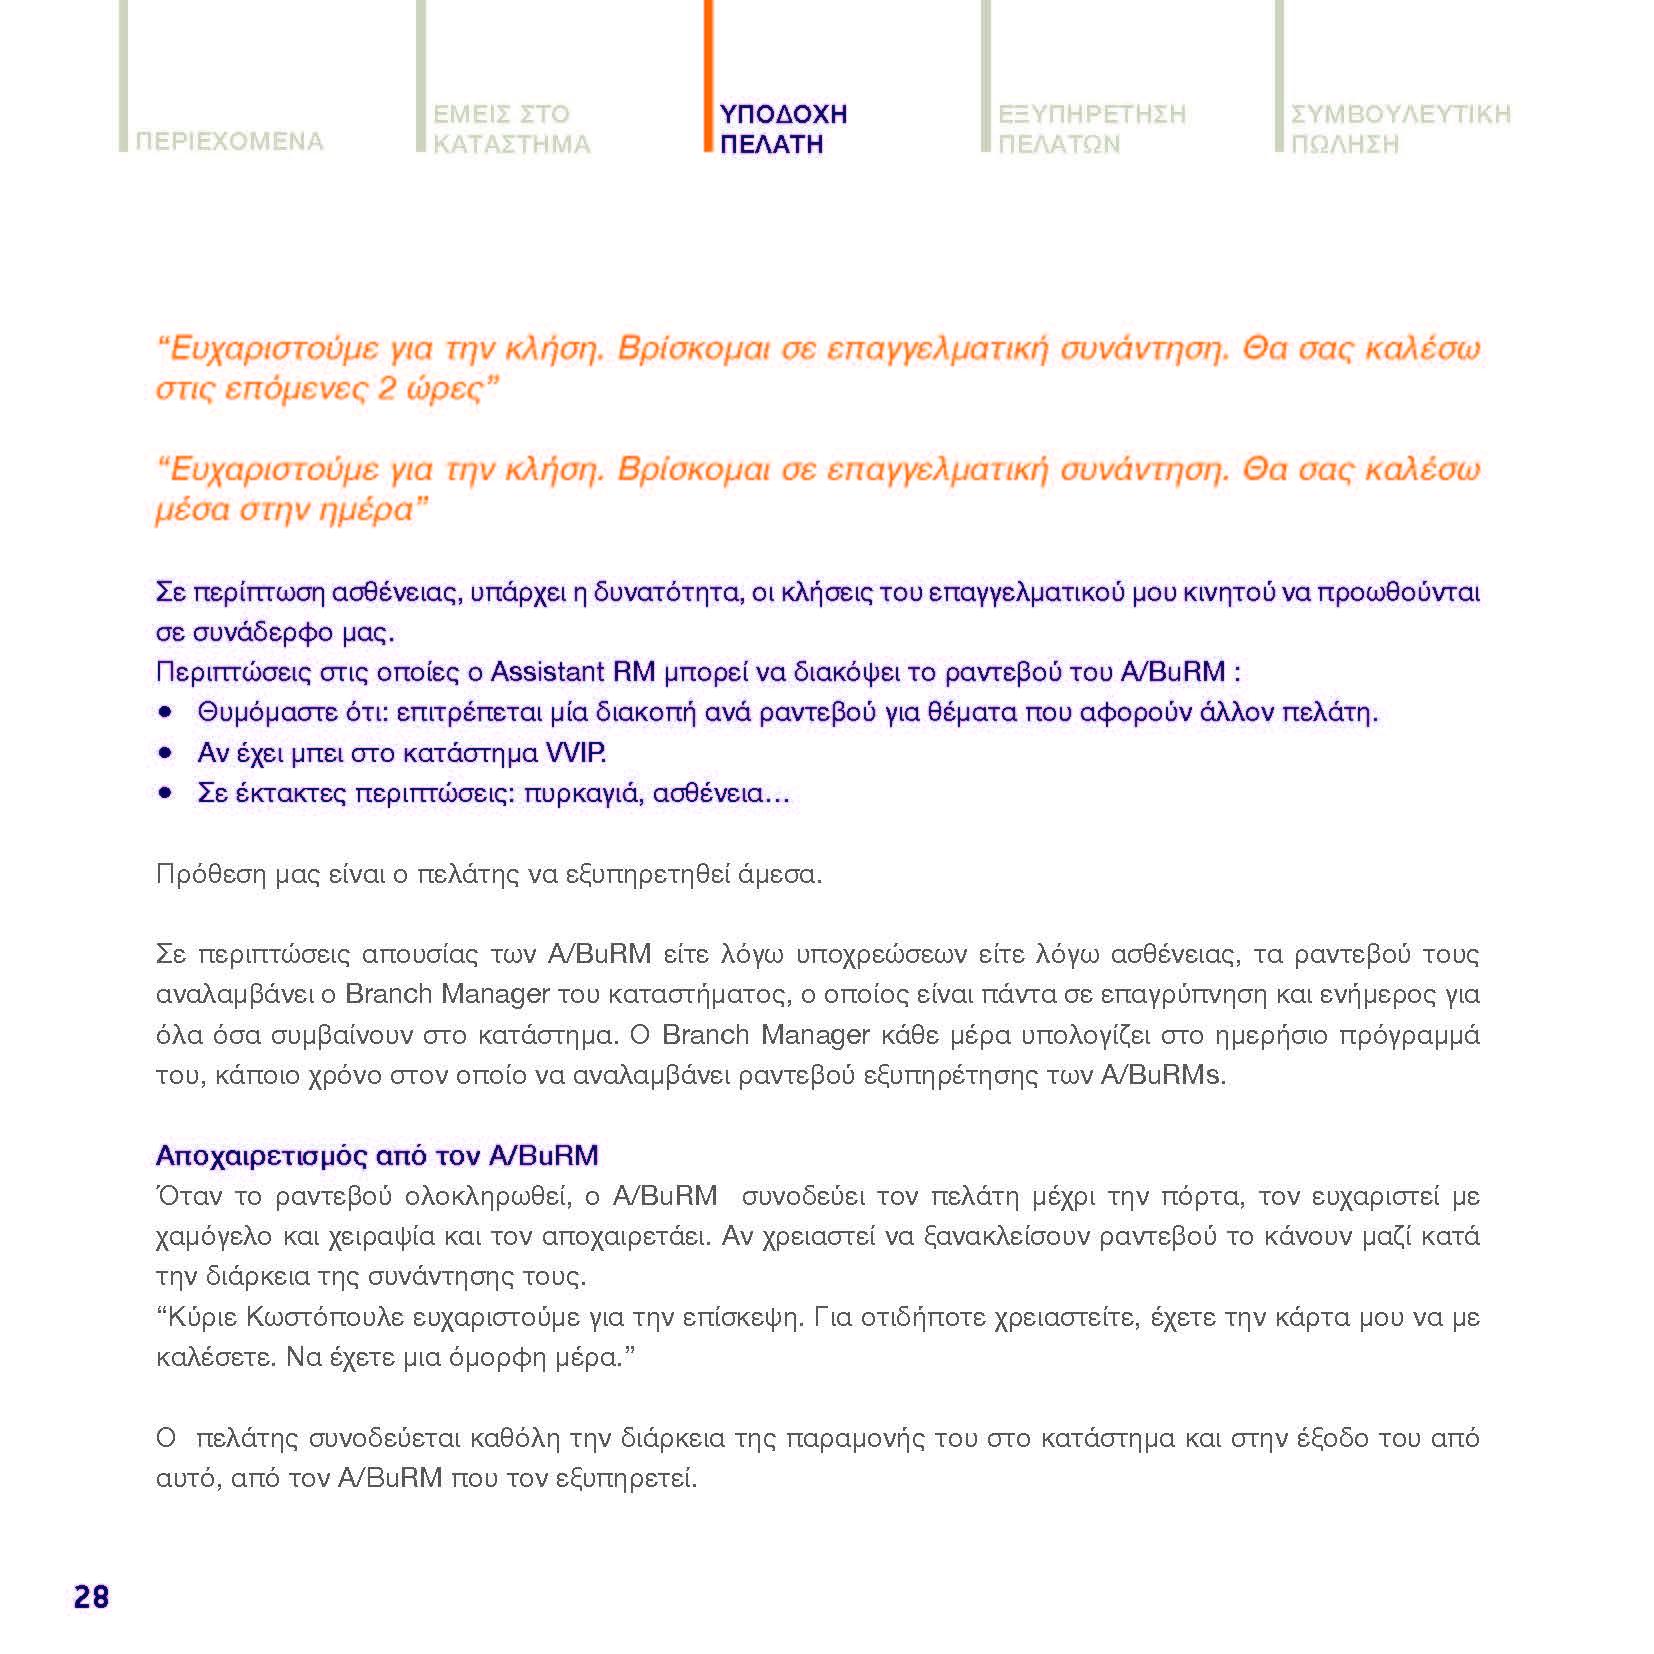 https://www.jib.gr/wp-content/uploads/2020/09/OPTIMA-BANK-BOOKLET-WEB_Page_028.jpg